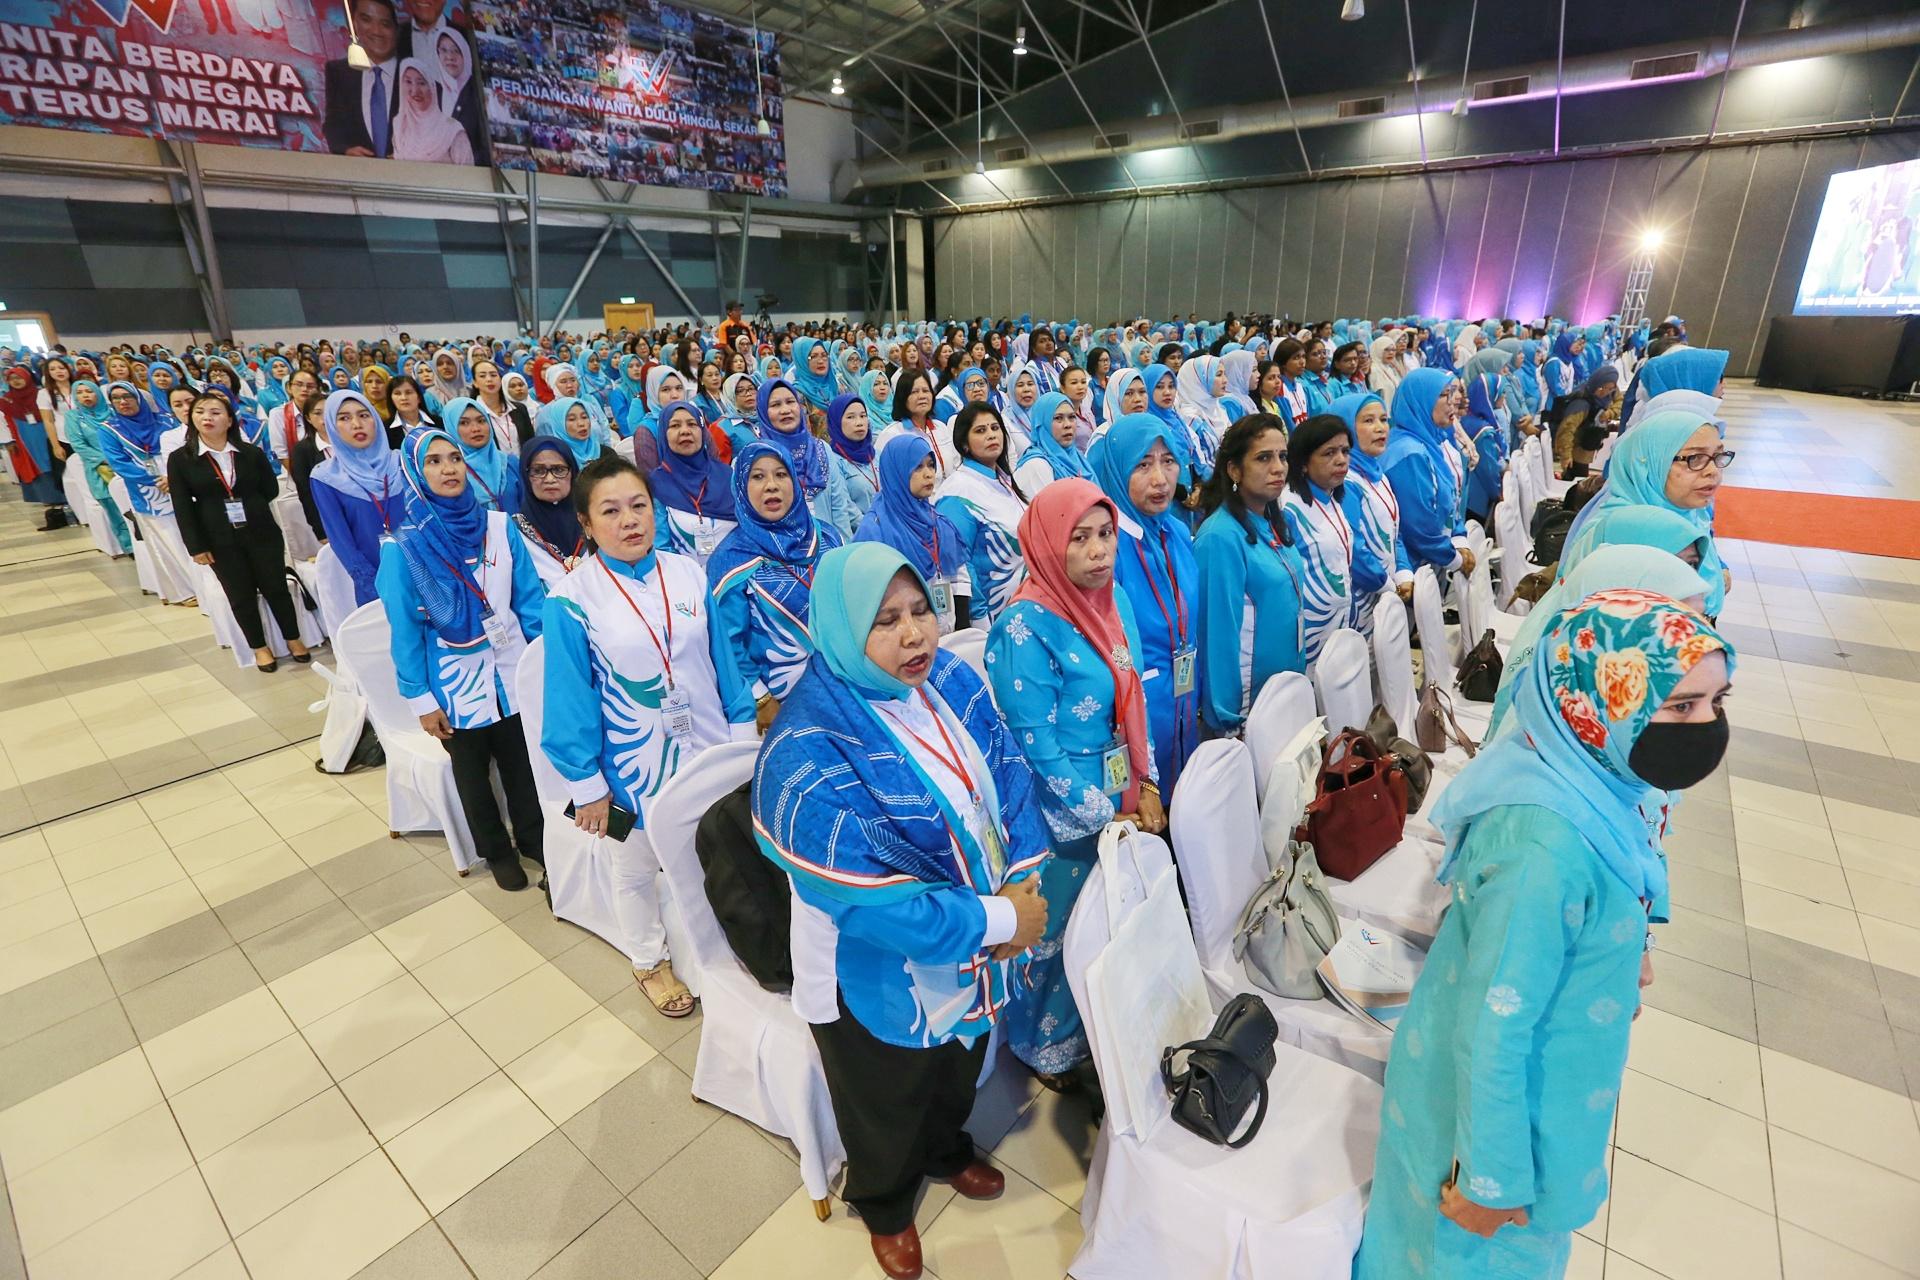 Delegates attend PKR Women's National Congress in Melaka December 6, 2019. — Picture by Ahmad Zamzahuri